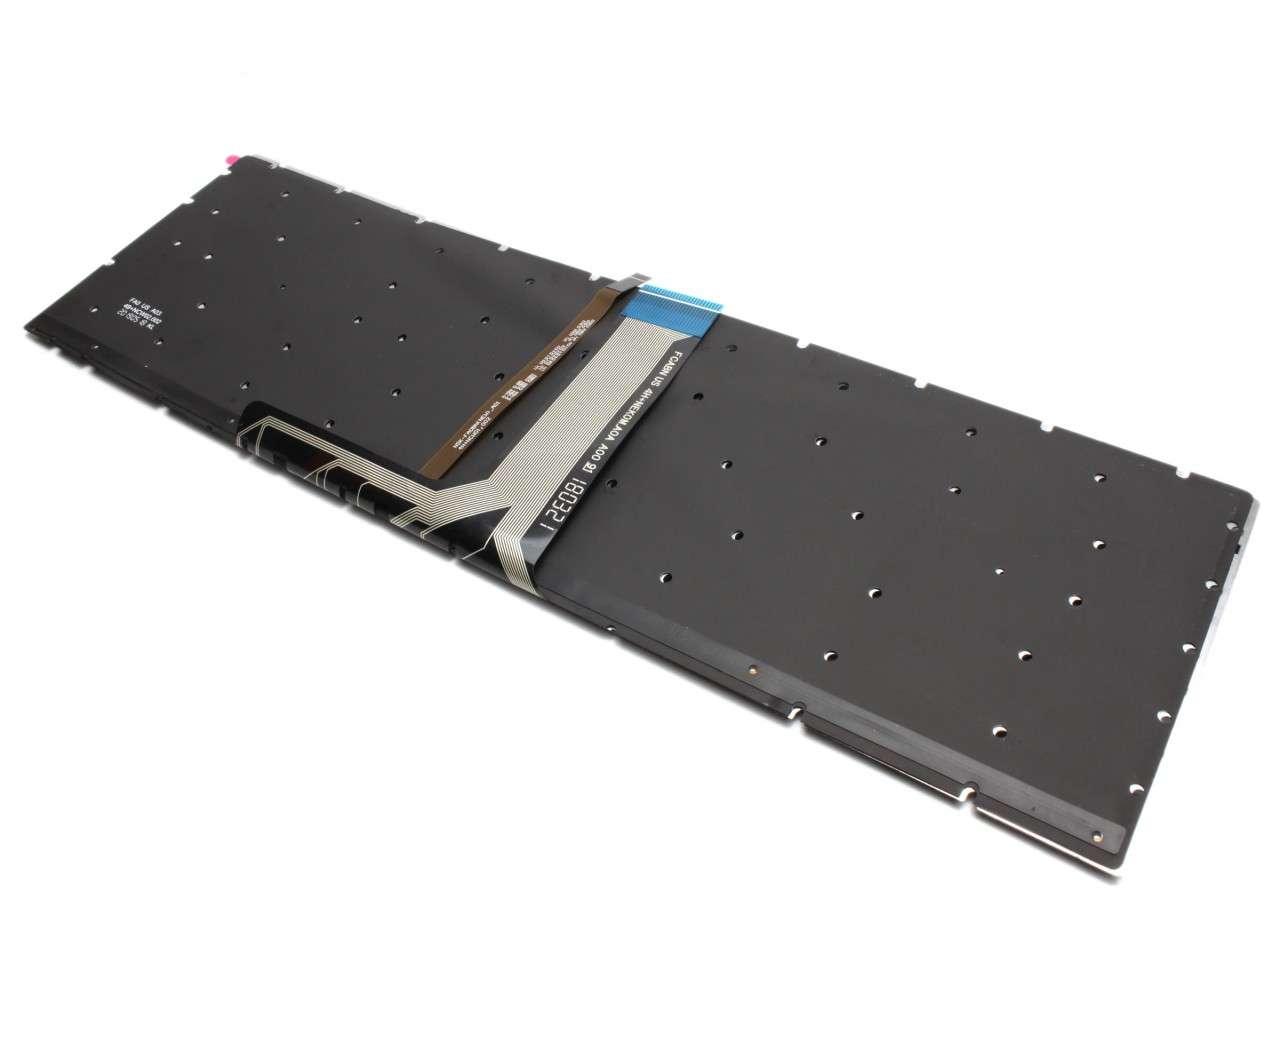 Tastatura MSI GE73VR 7RF Raider iluminata layout US fara rama enter mic imagine powerlaptop.ro 2021